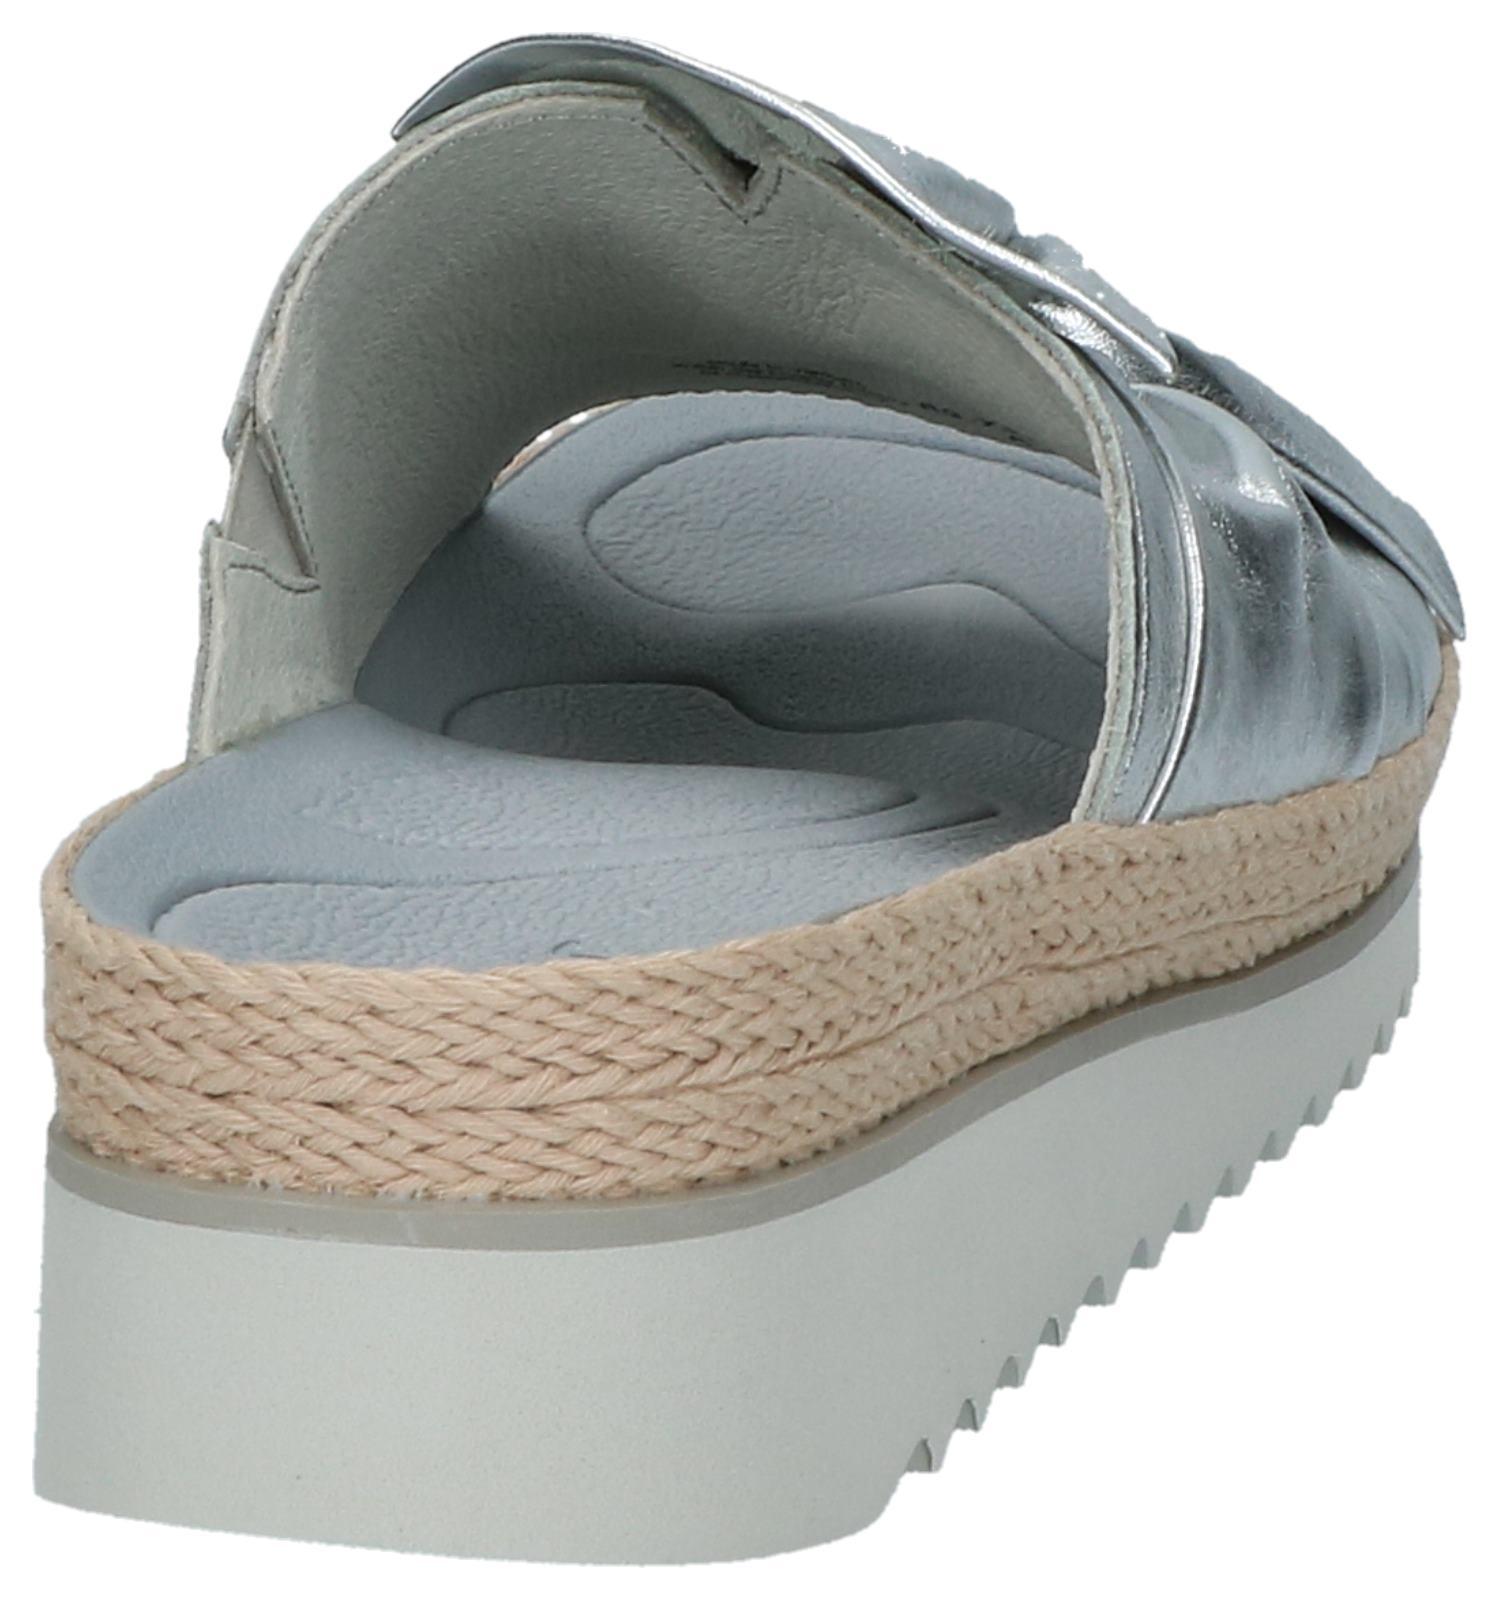 Zilver Comfortabele Gabor Slippers Best Fitting wOnNk80PXZ